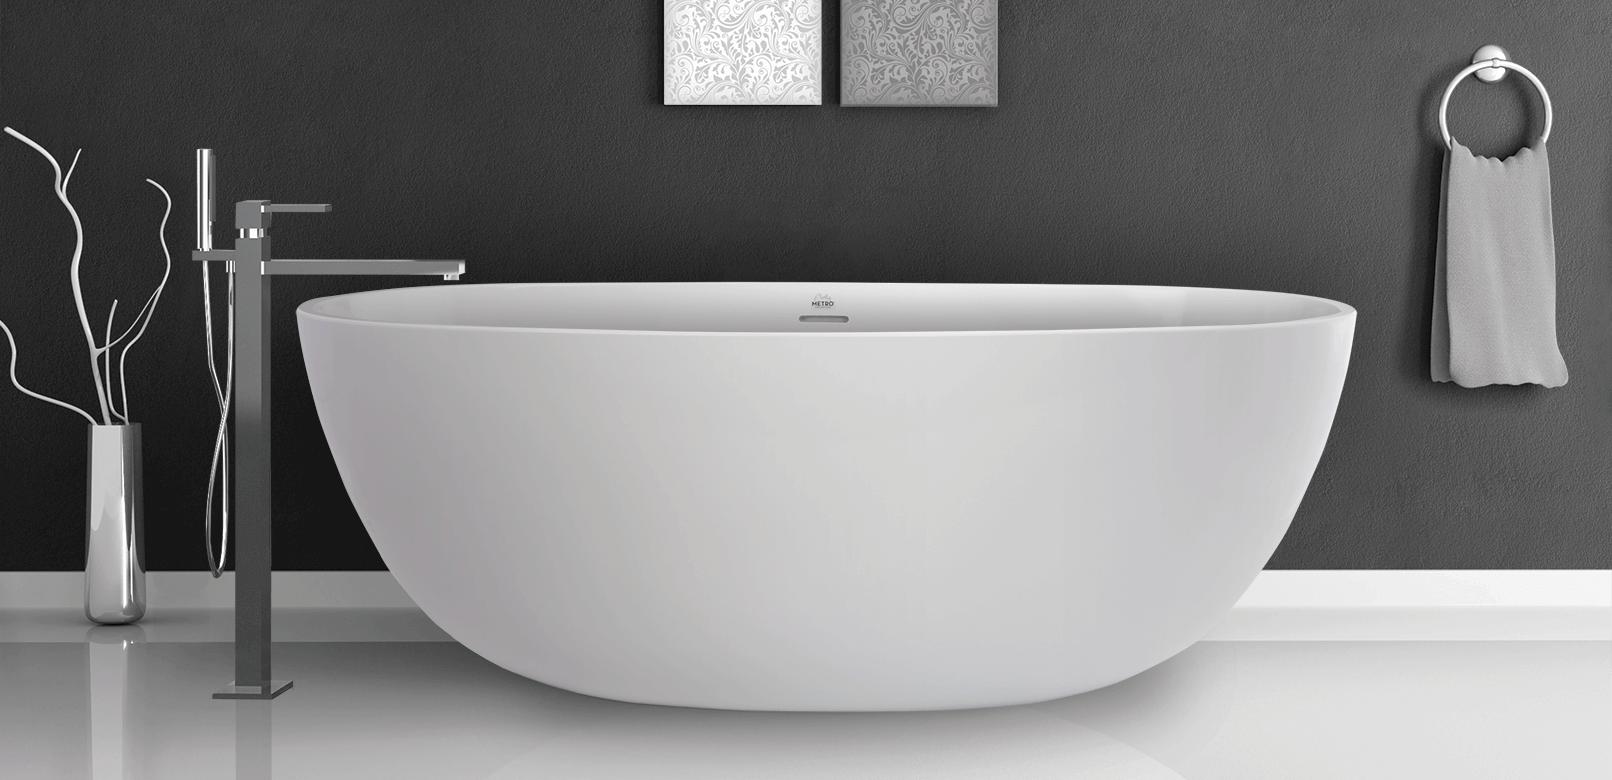 freestanding tub with grab bar - Google Search | Urban Organic ...